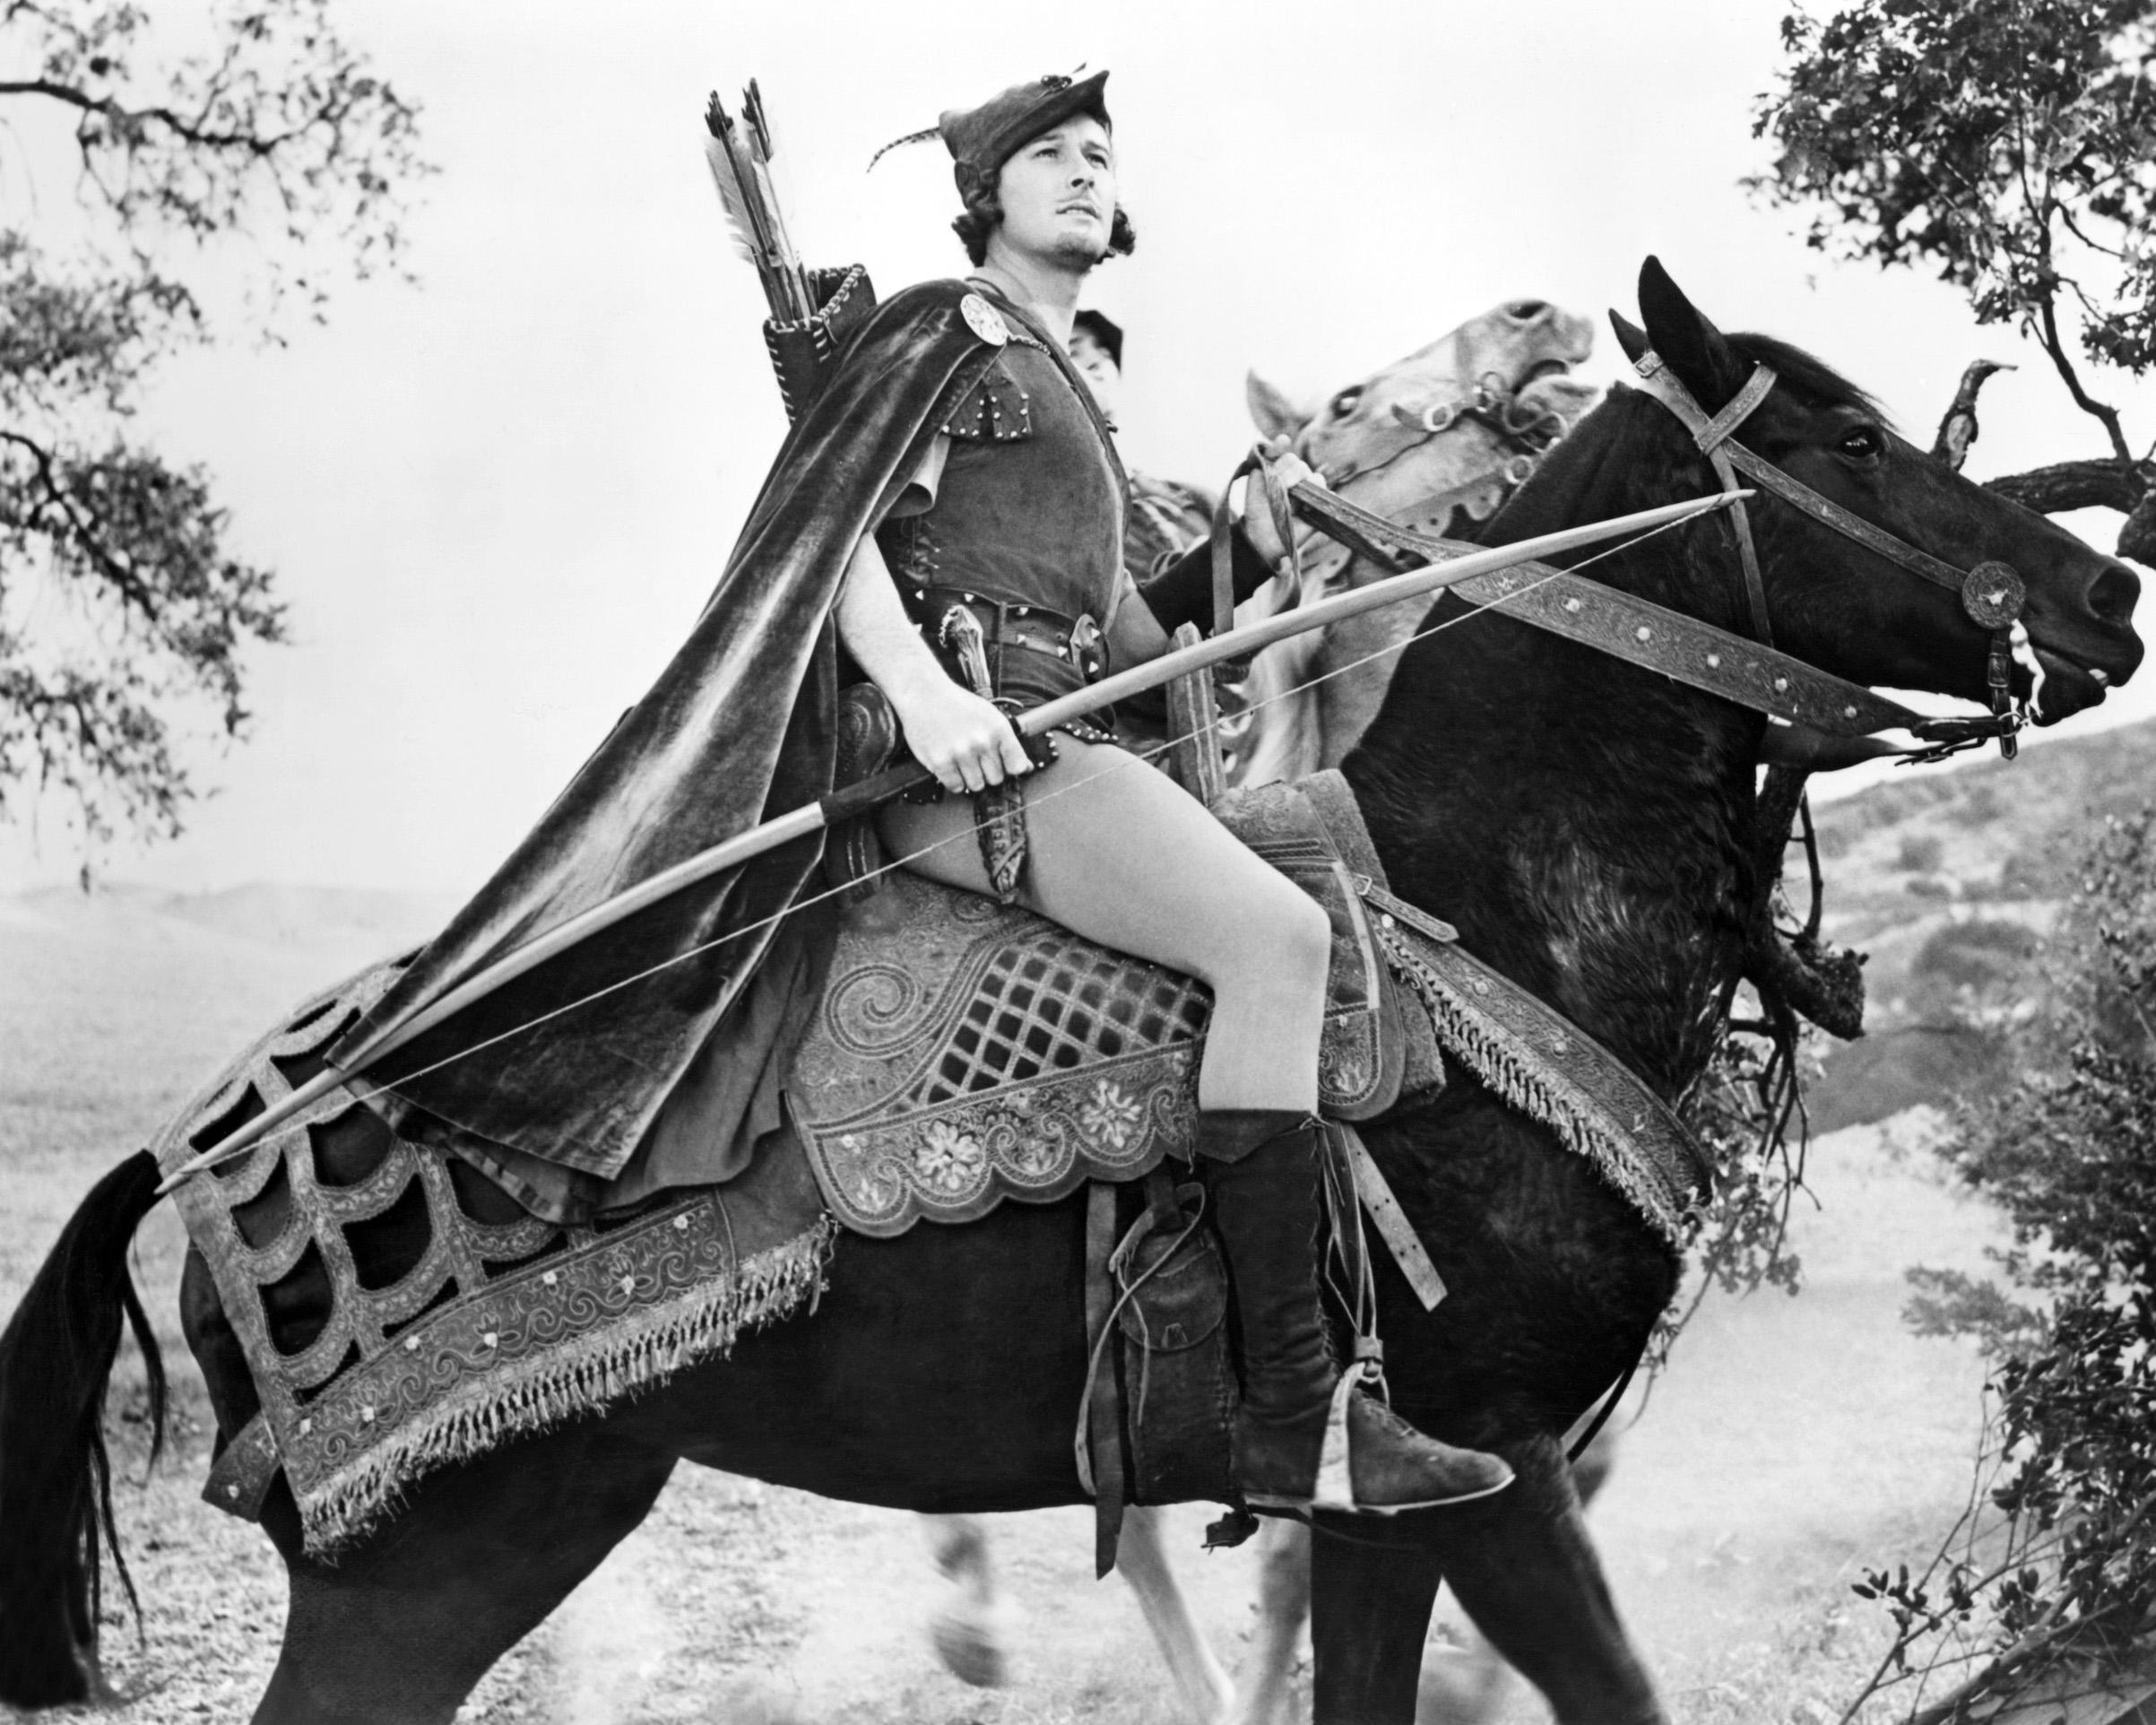 Actor Errol Flynn as Robin Hood in the film 'The Adventures of Robin Hood', 1938.